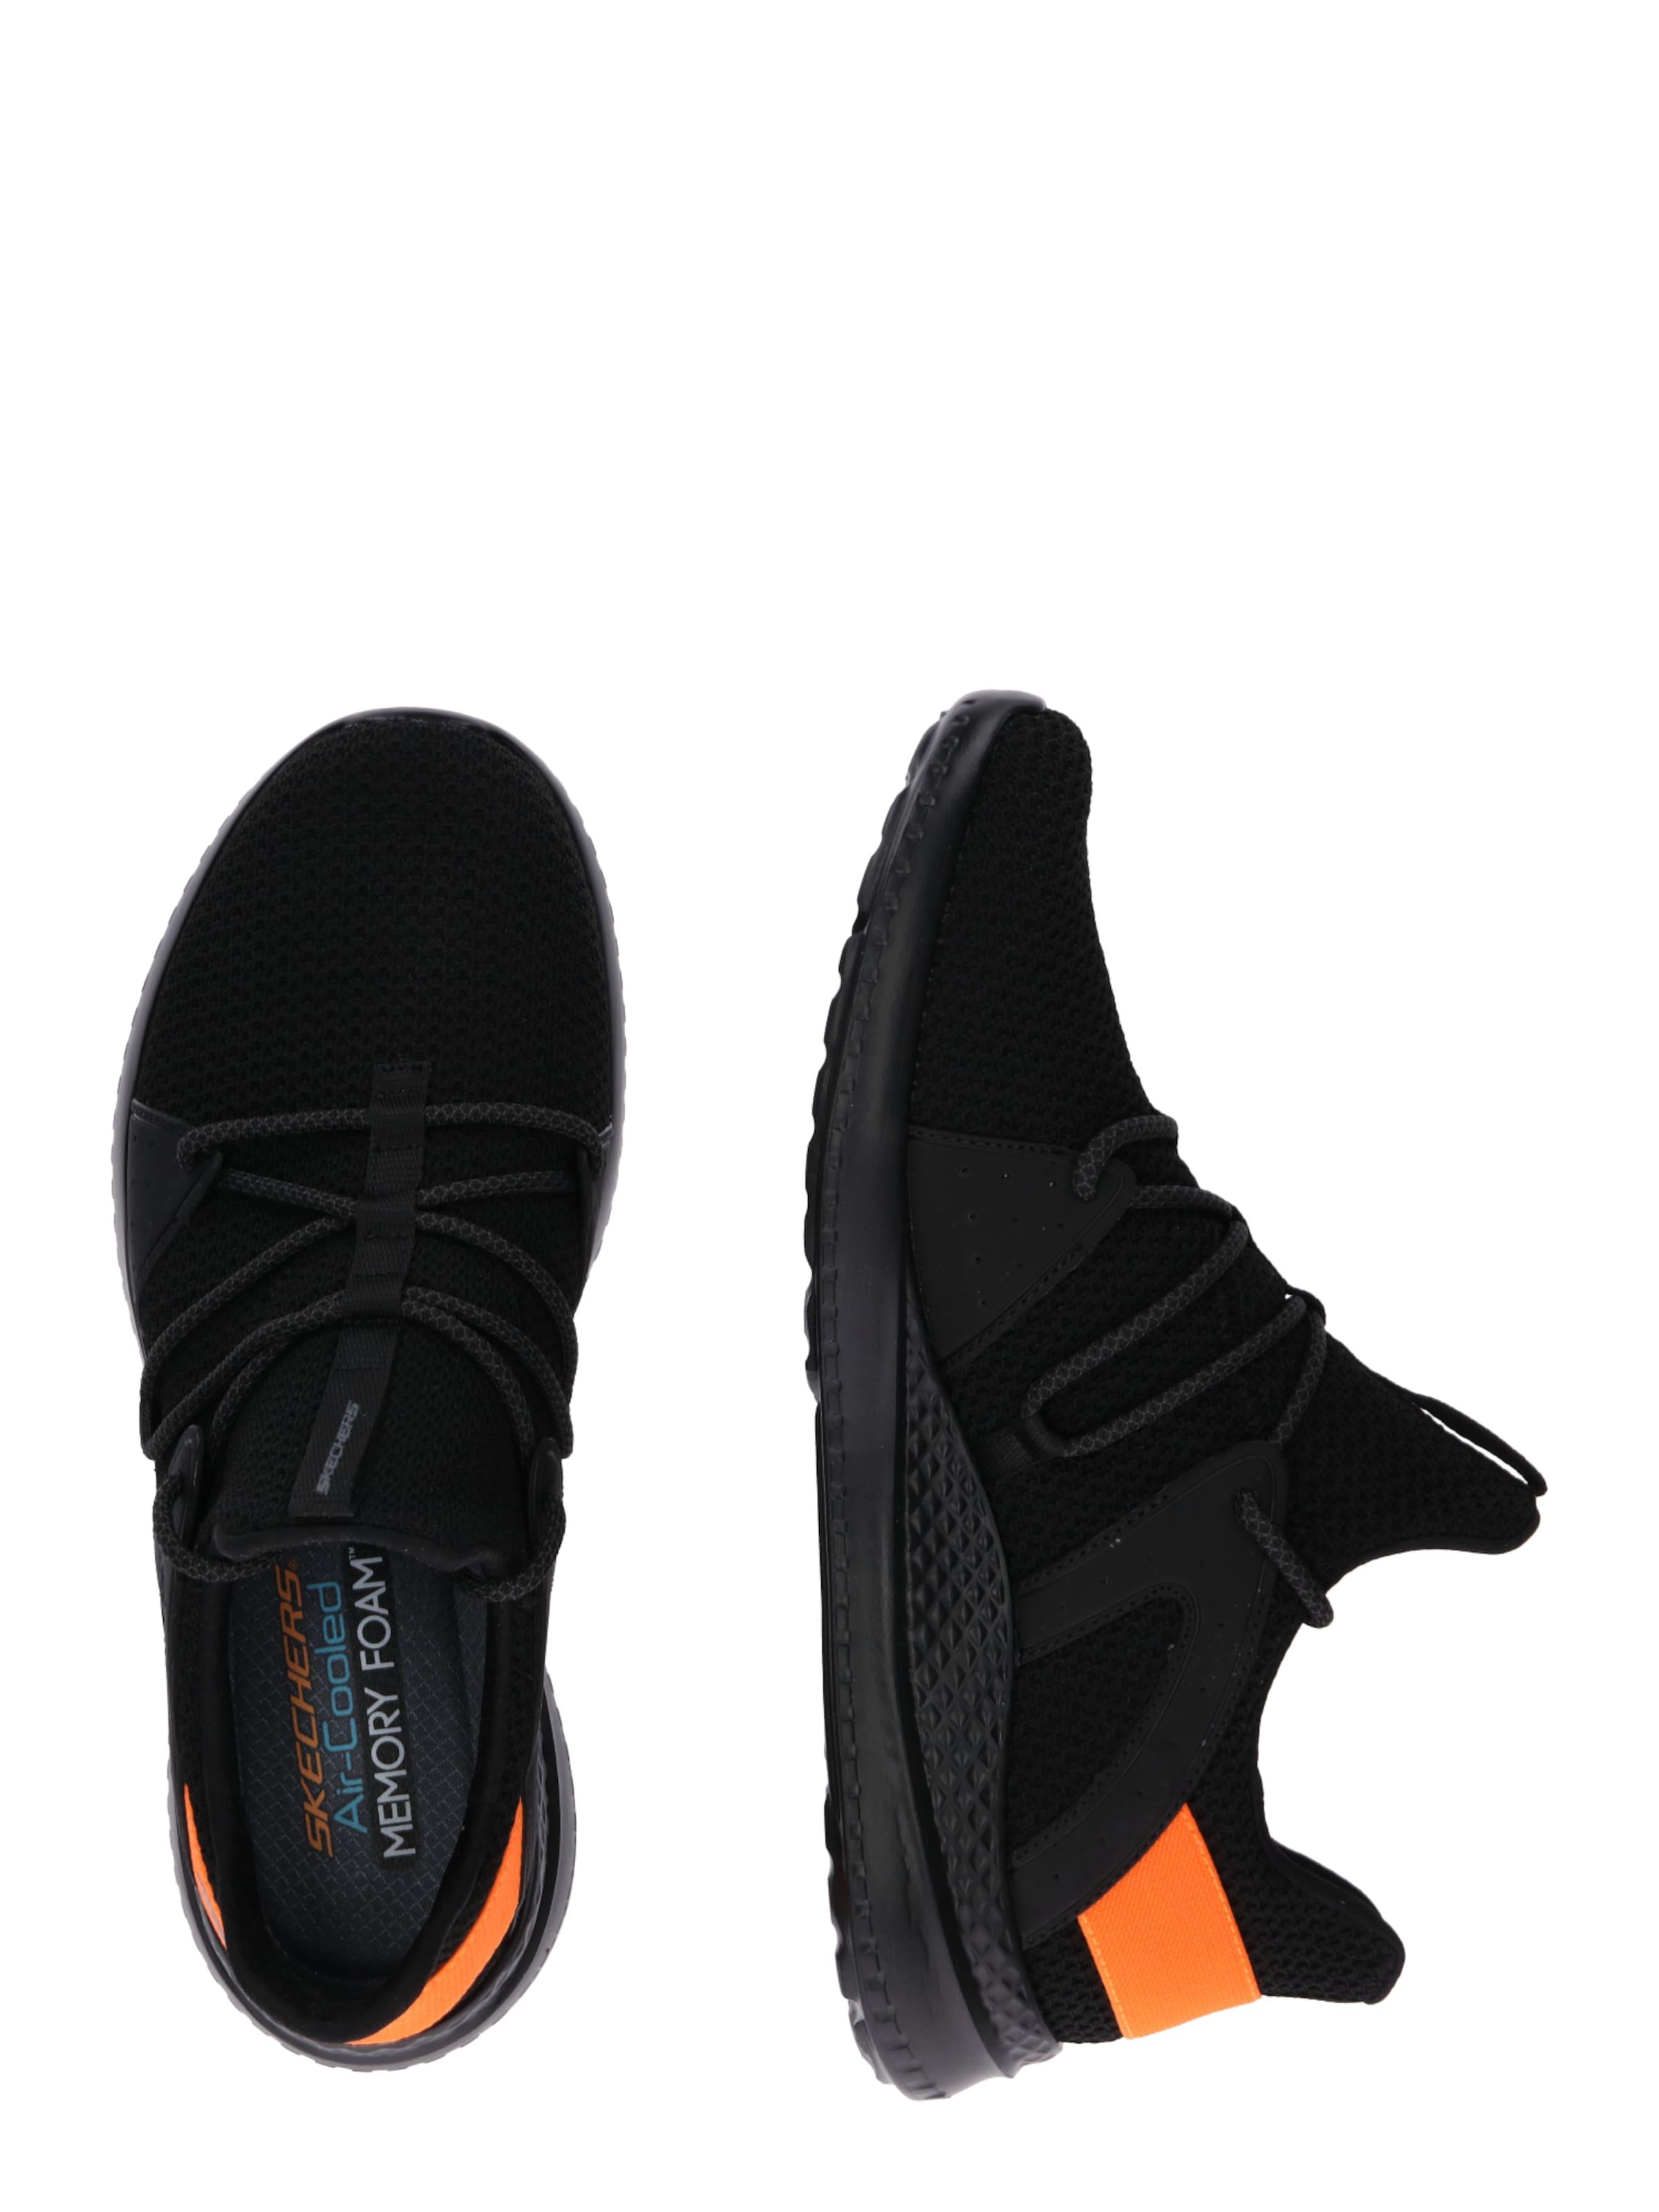 'materaStrongland' Skechers 'materaStrongland' 'materaStrongland' Skechers In HellorangeSchwarz HellorangeSchwarz Skechers Sneaker Sneaker Sneaker In zVLqSMUpG